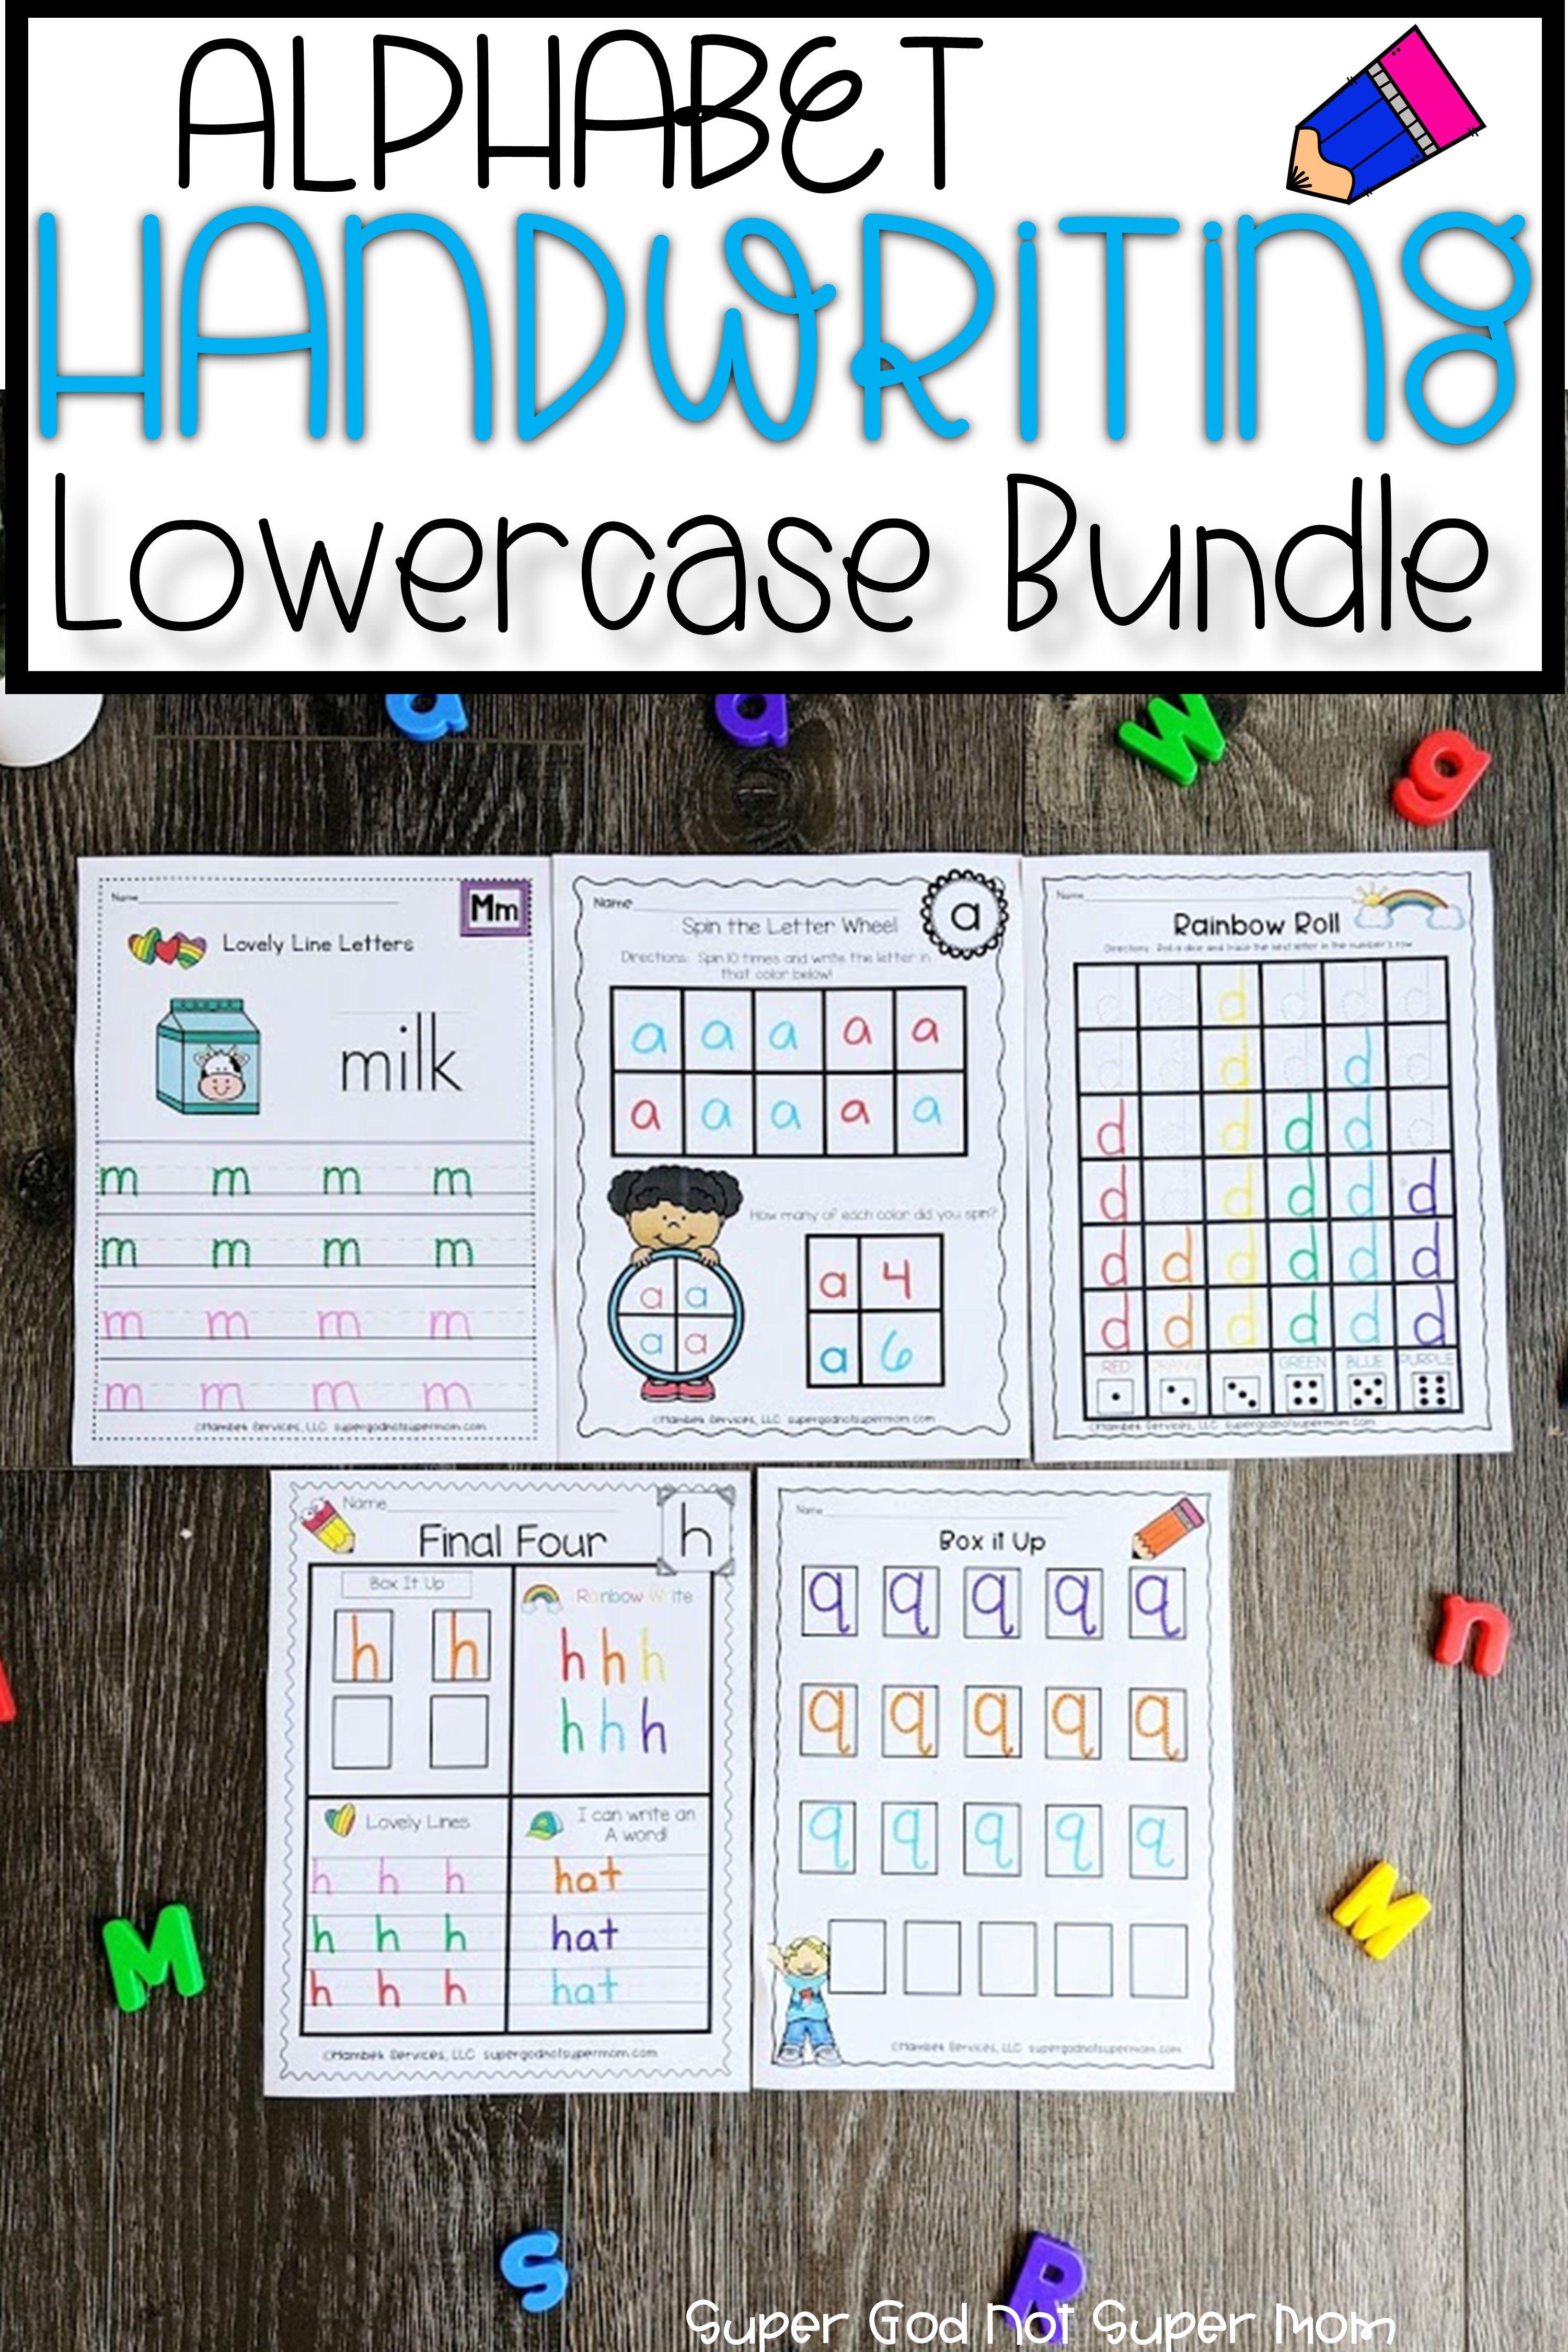 Alphabet Handwriting Worksheets Super God Not Super Mom Alphabet Activities Preschool Alphabet Preschool School Activities [ 4500 x 3000 Pixel ]